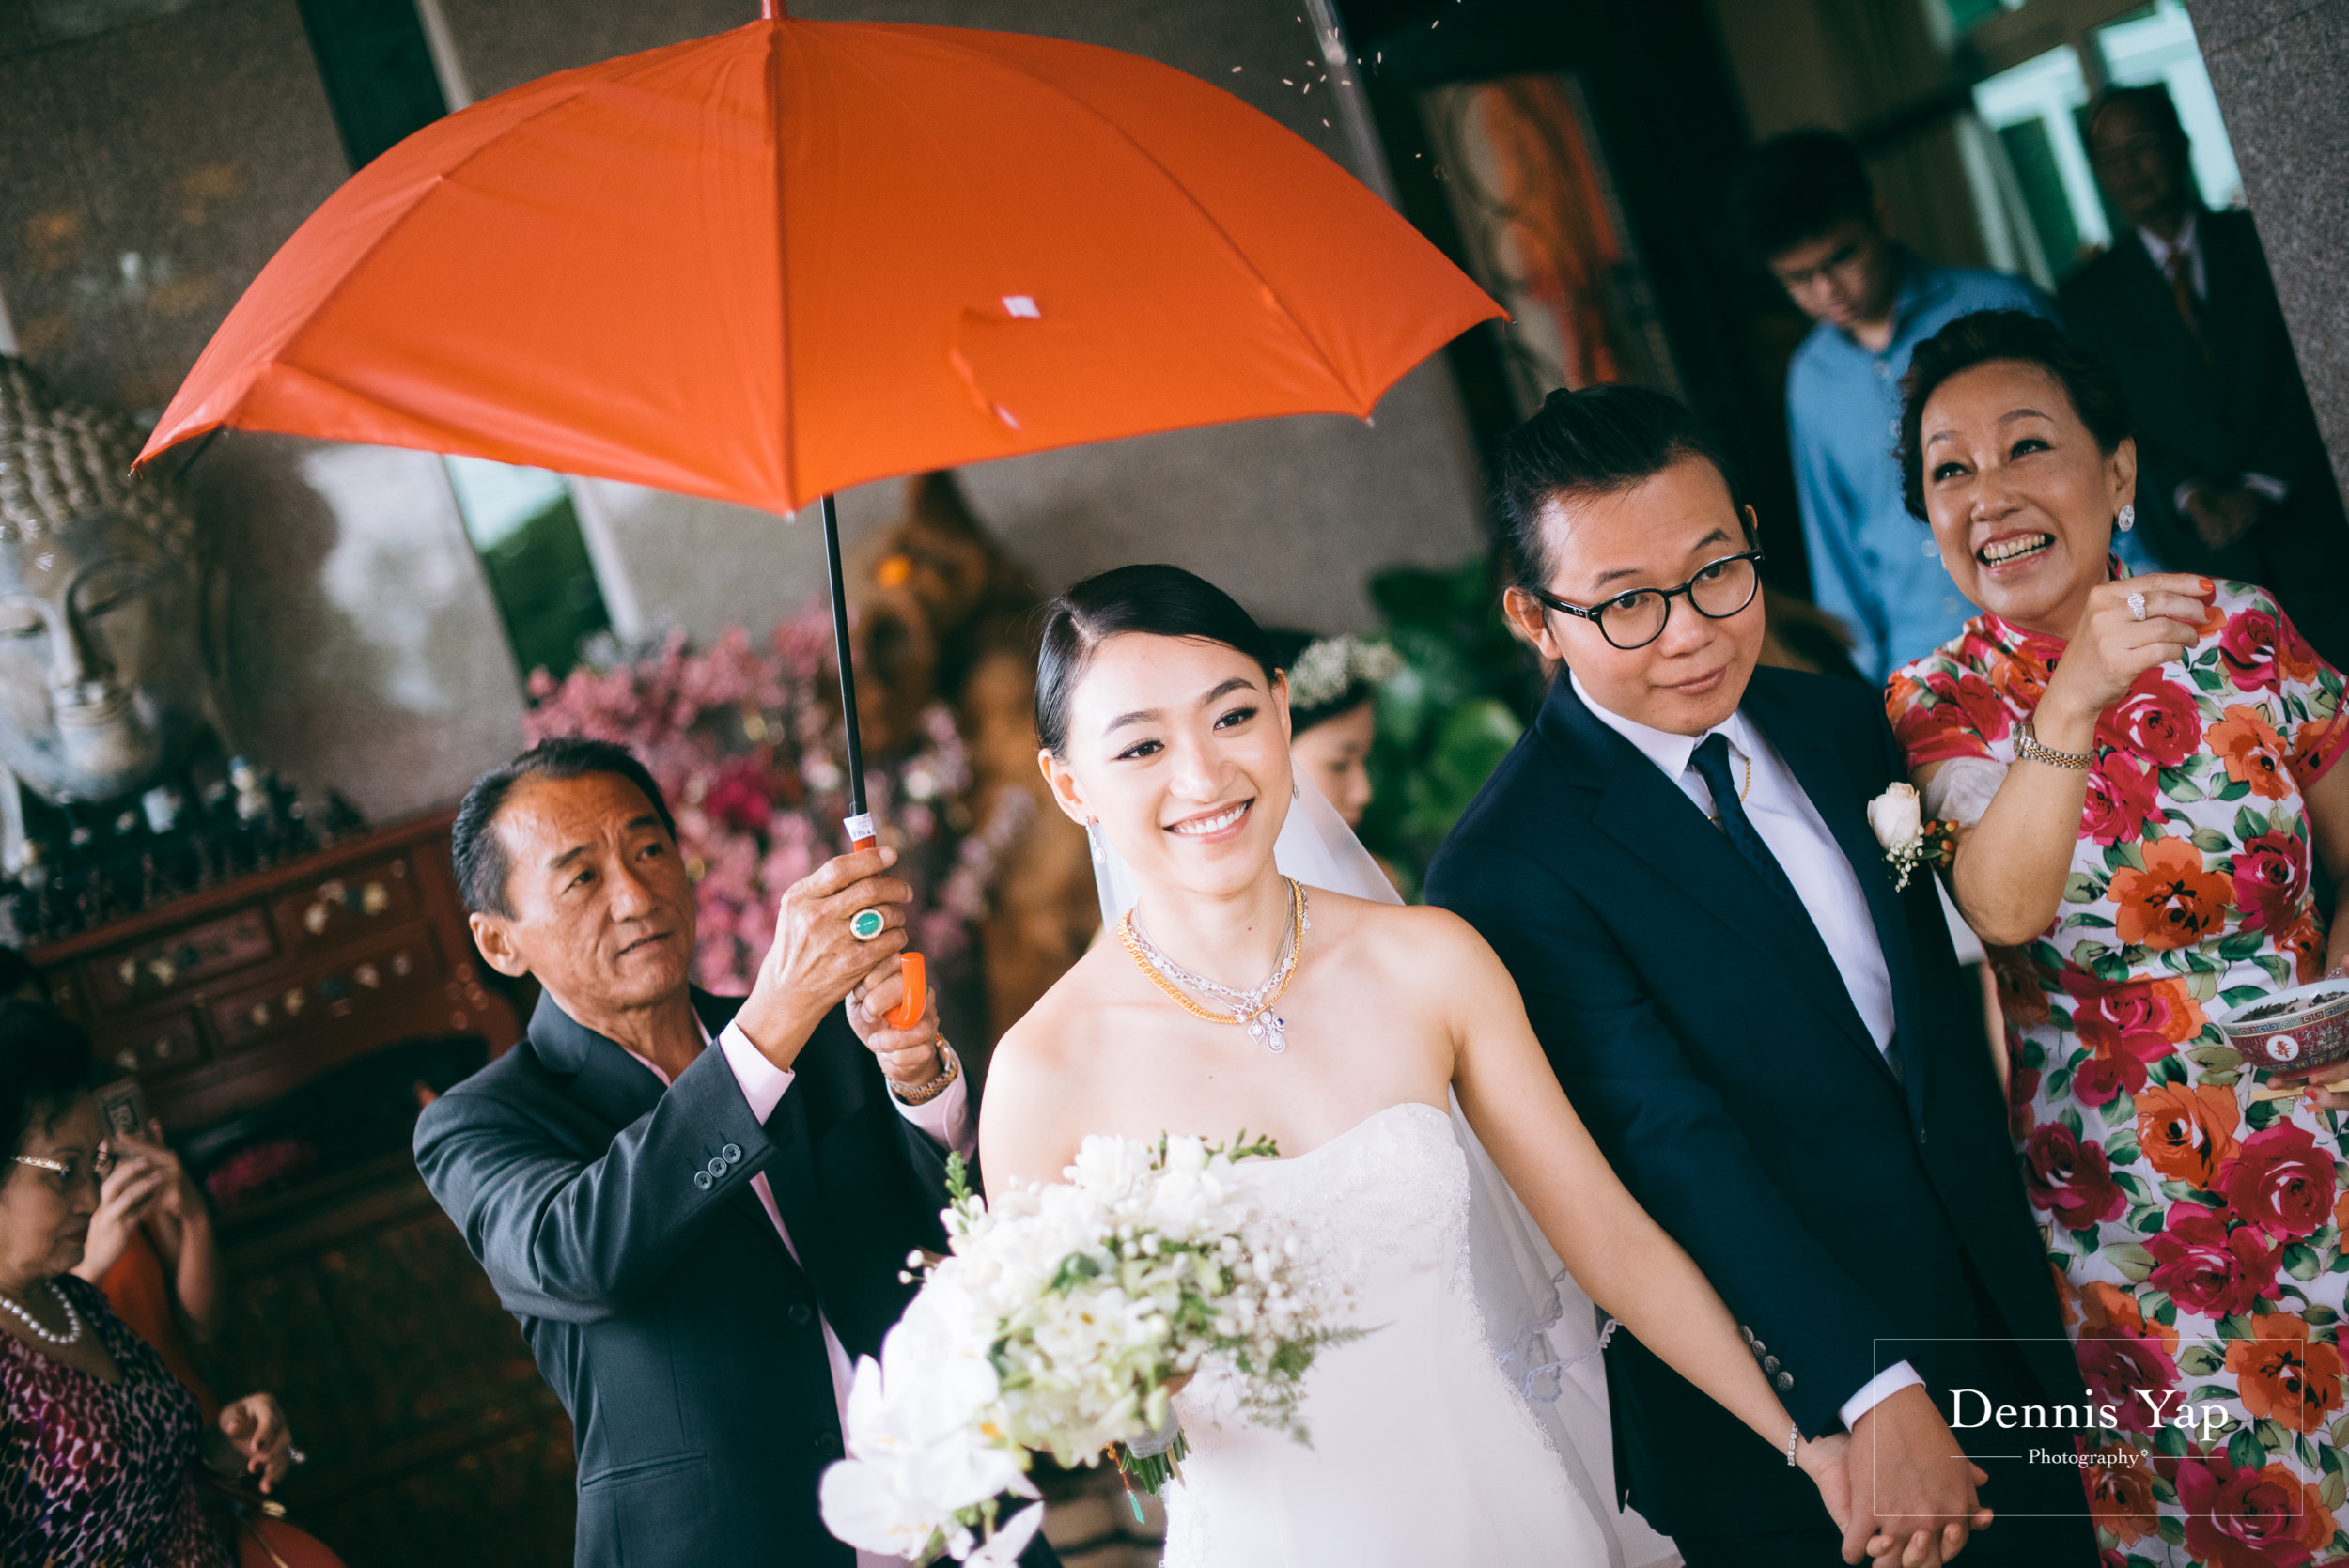 sandro kitty wedding day majestic hotel kuala lumpur dennis yap photography malaysia top wedding photographer-10.jpg